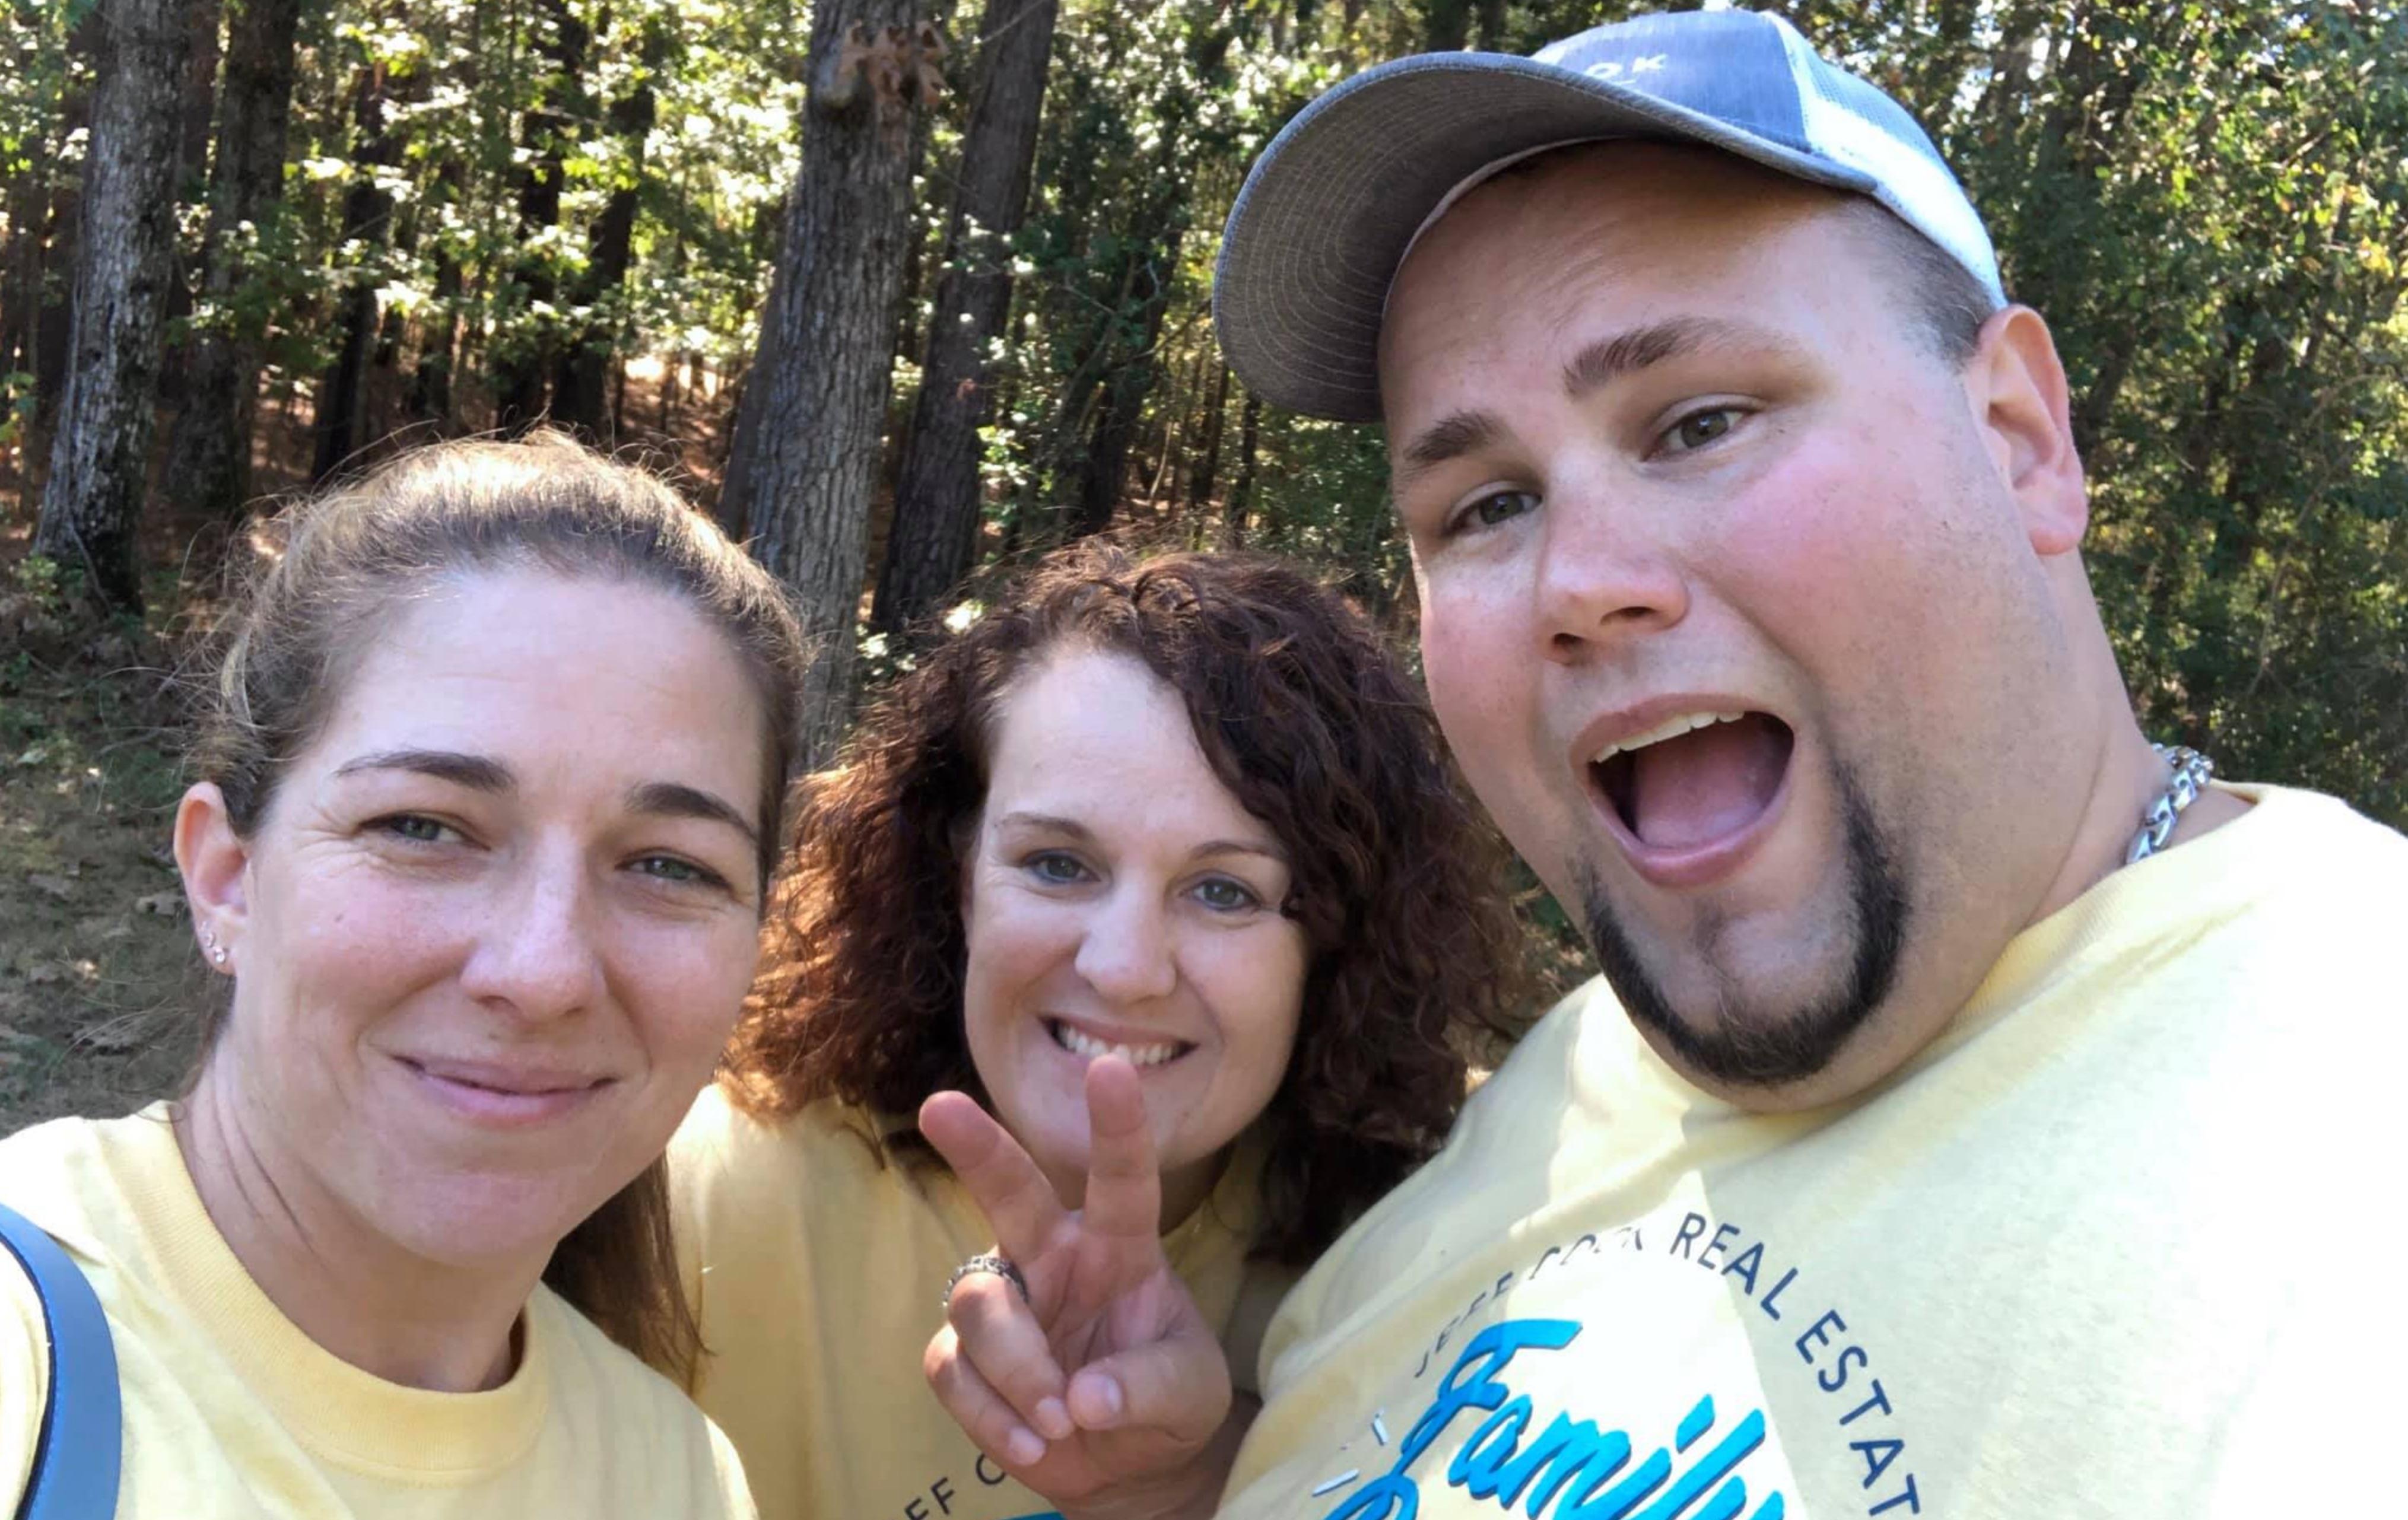 Jeff Cook, Sarah Cook and Jessica Clark at the JCRE reunion!